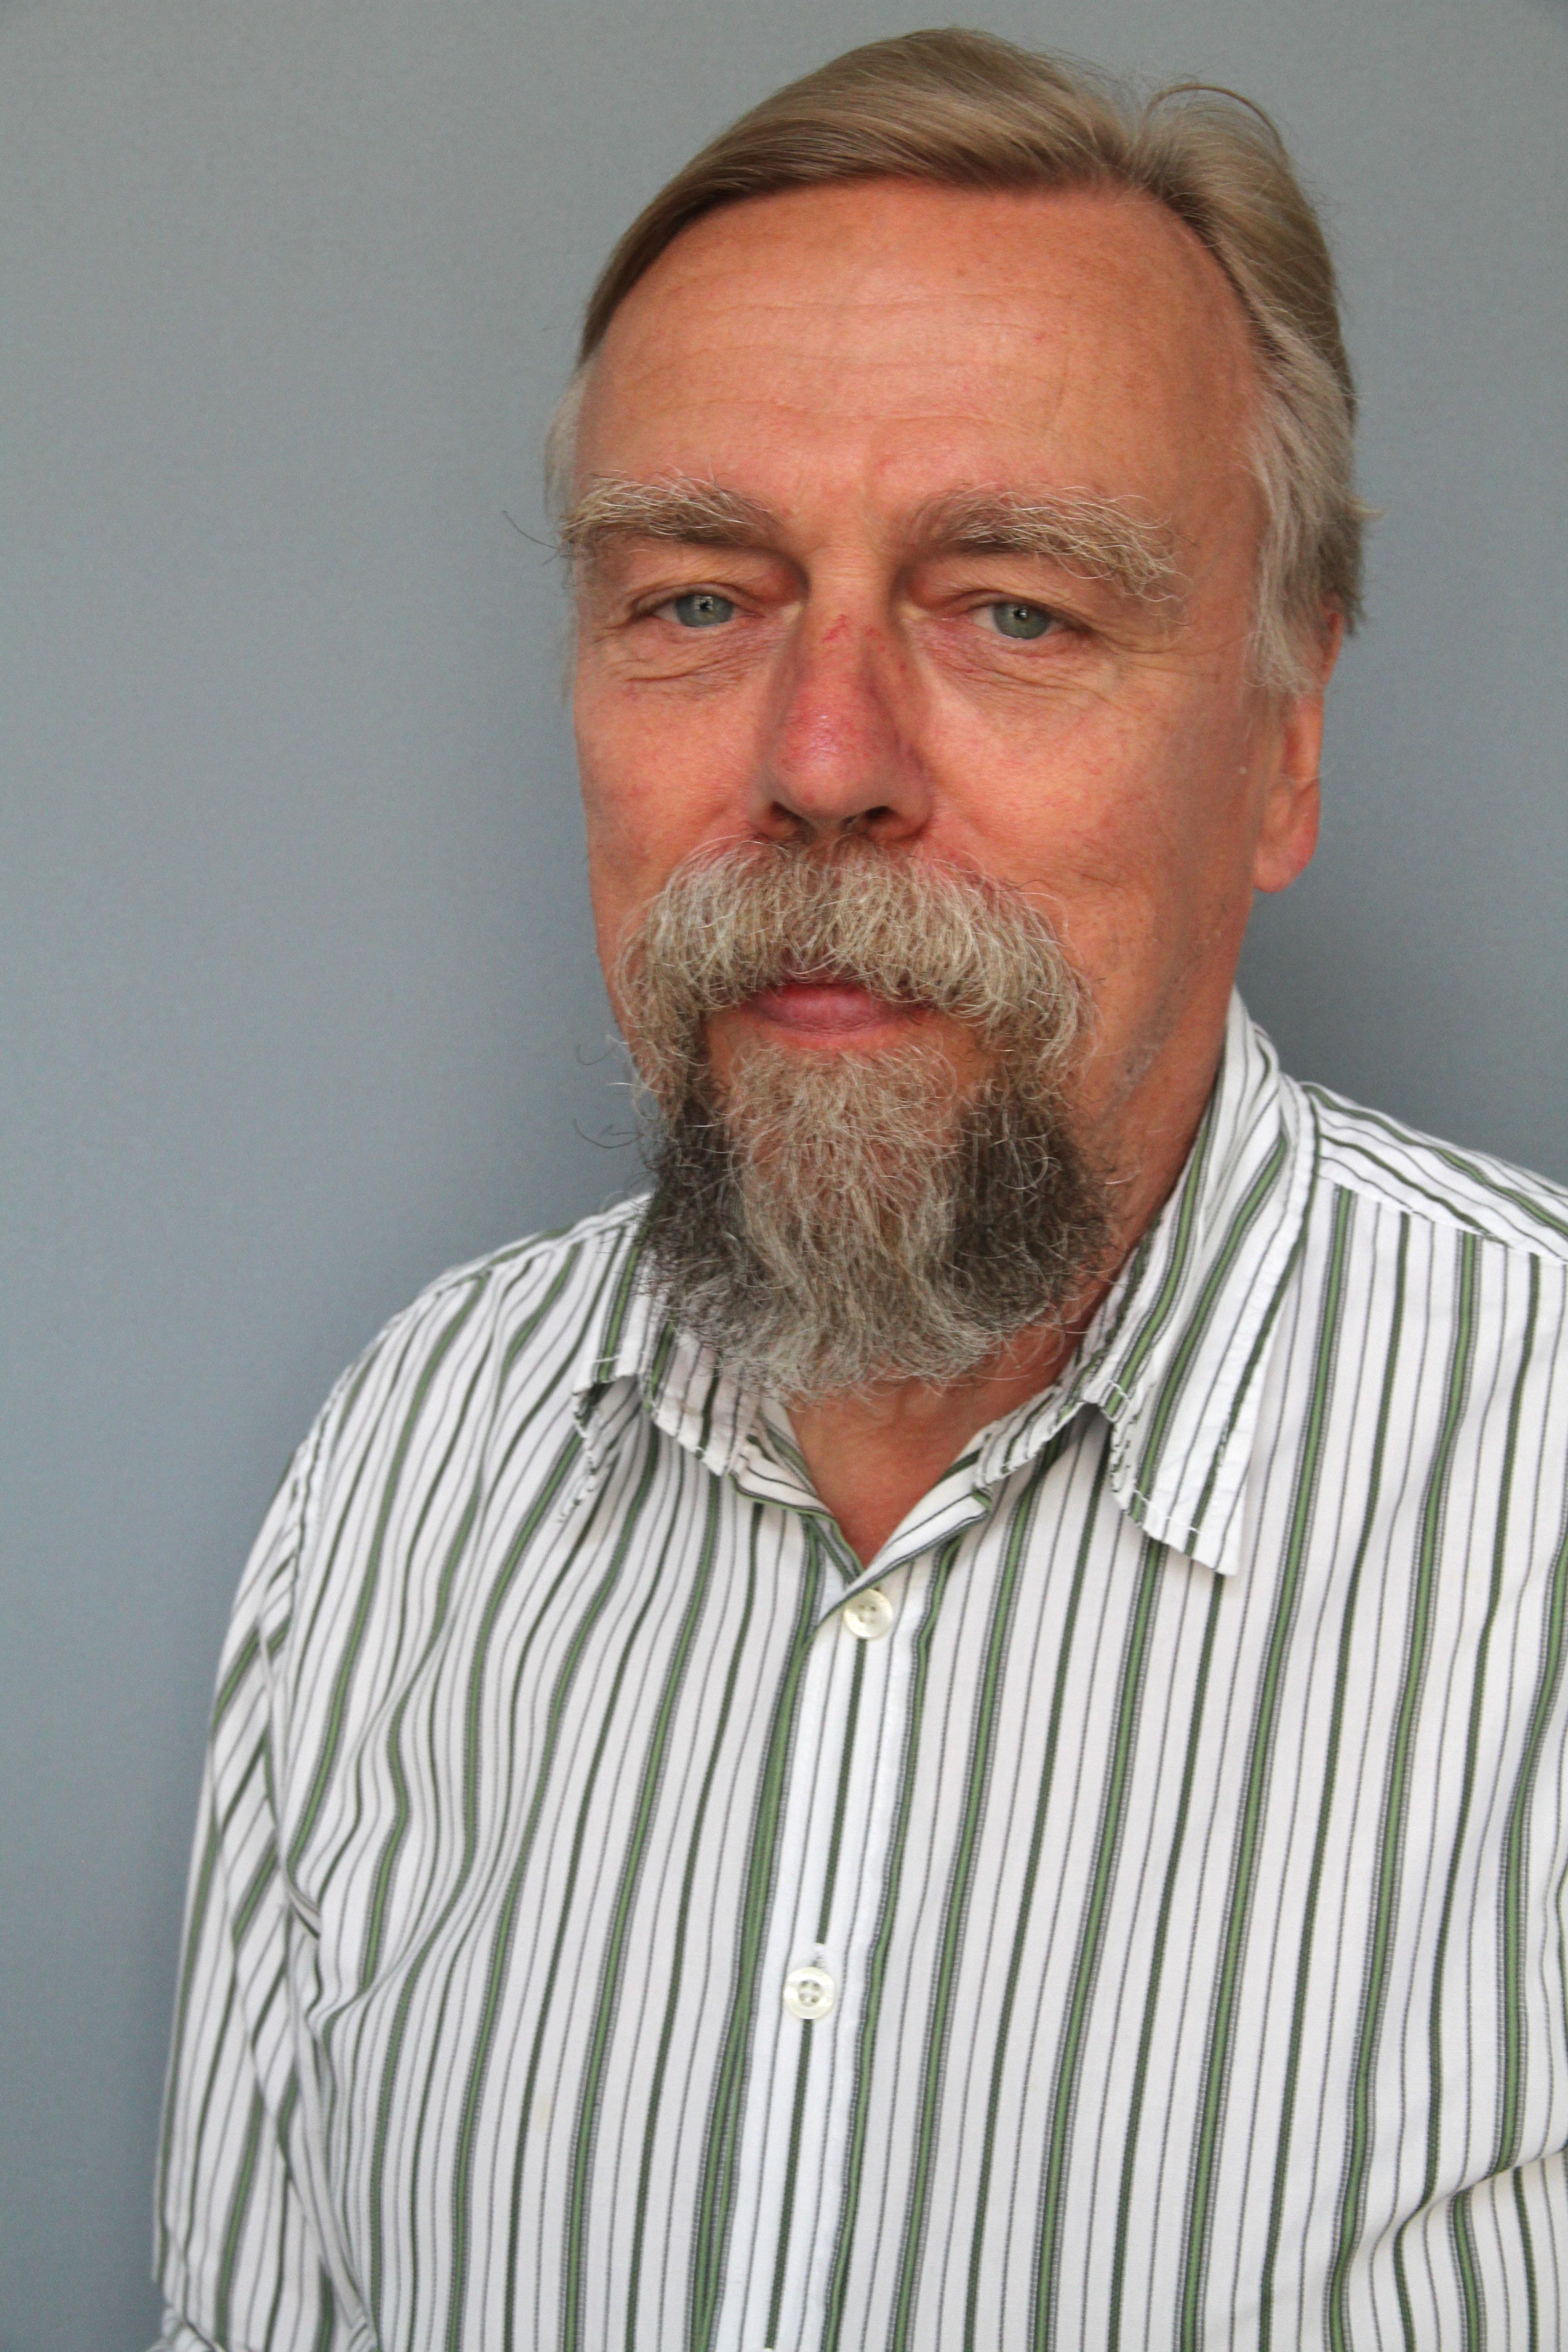 Olof Biström